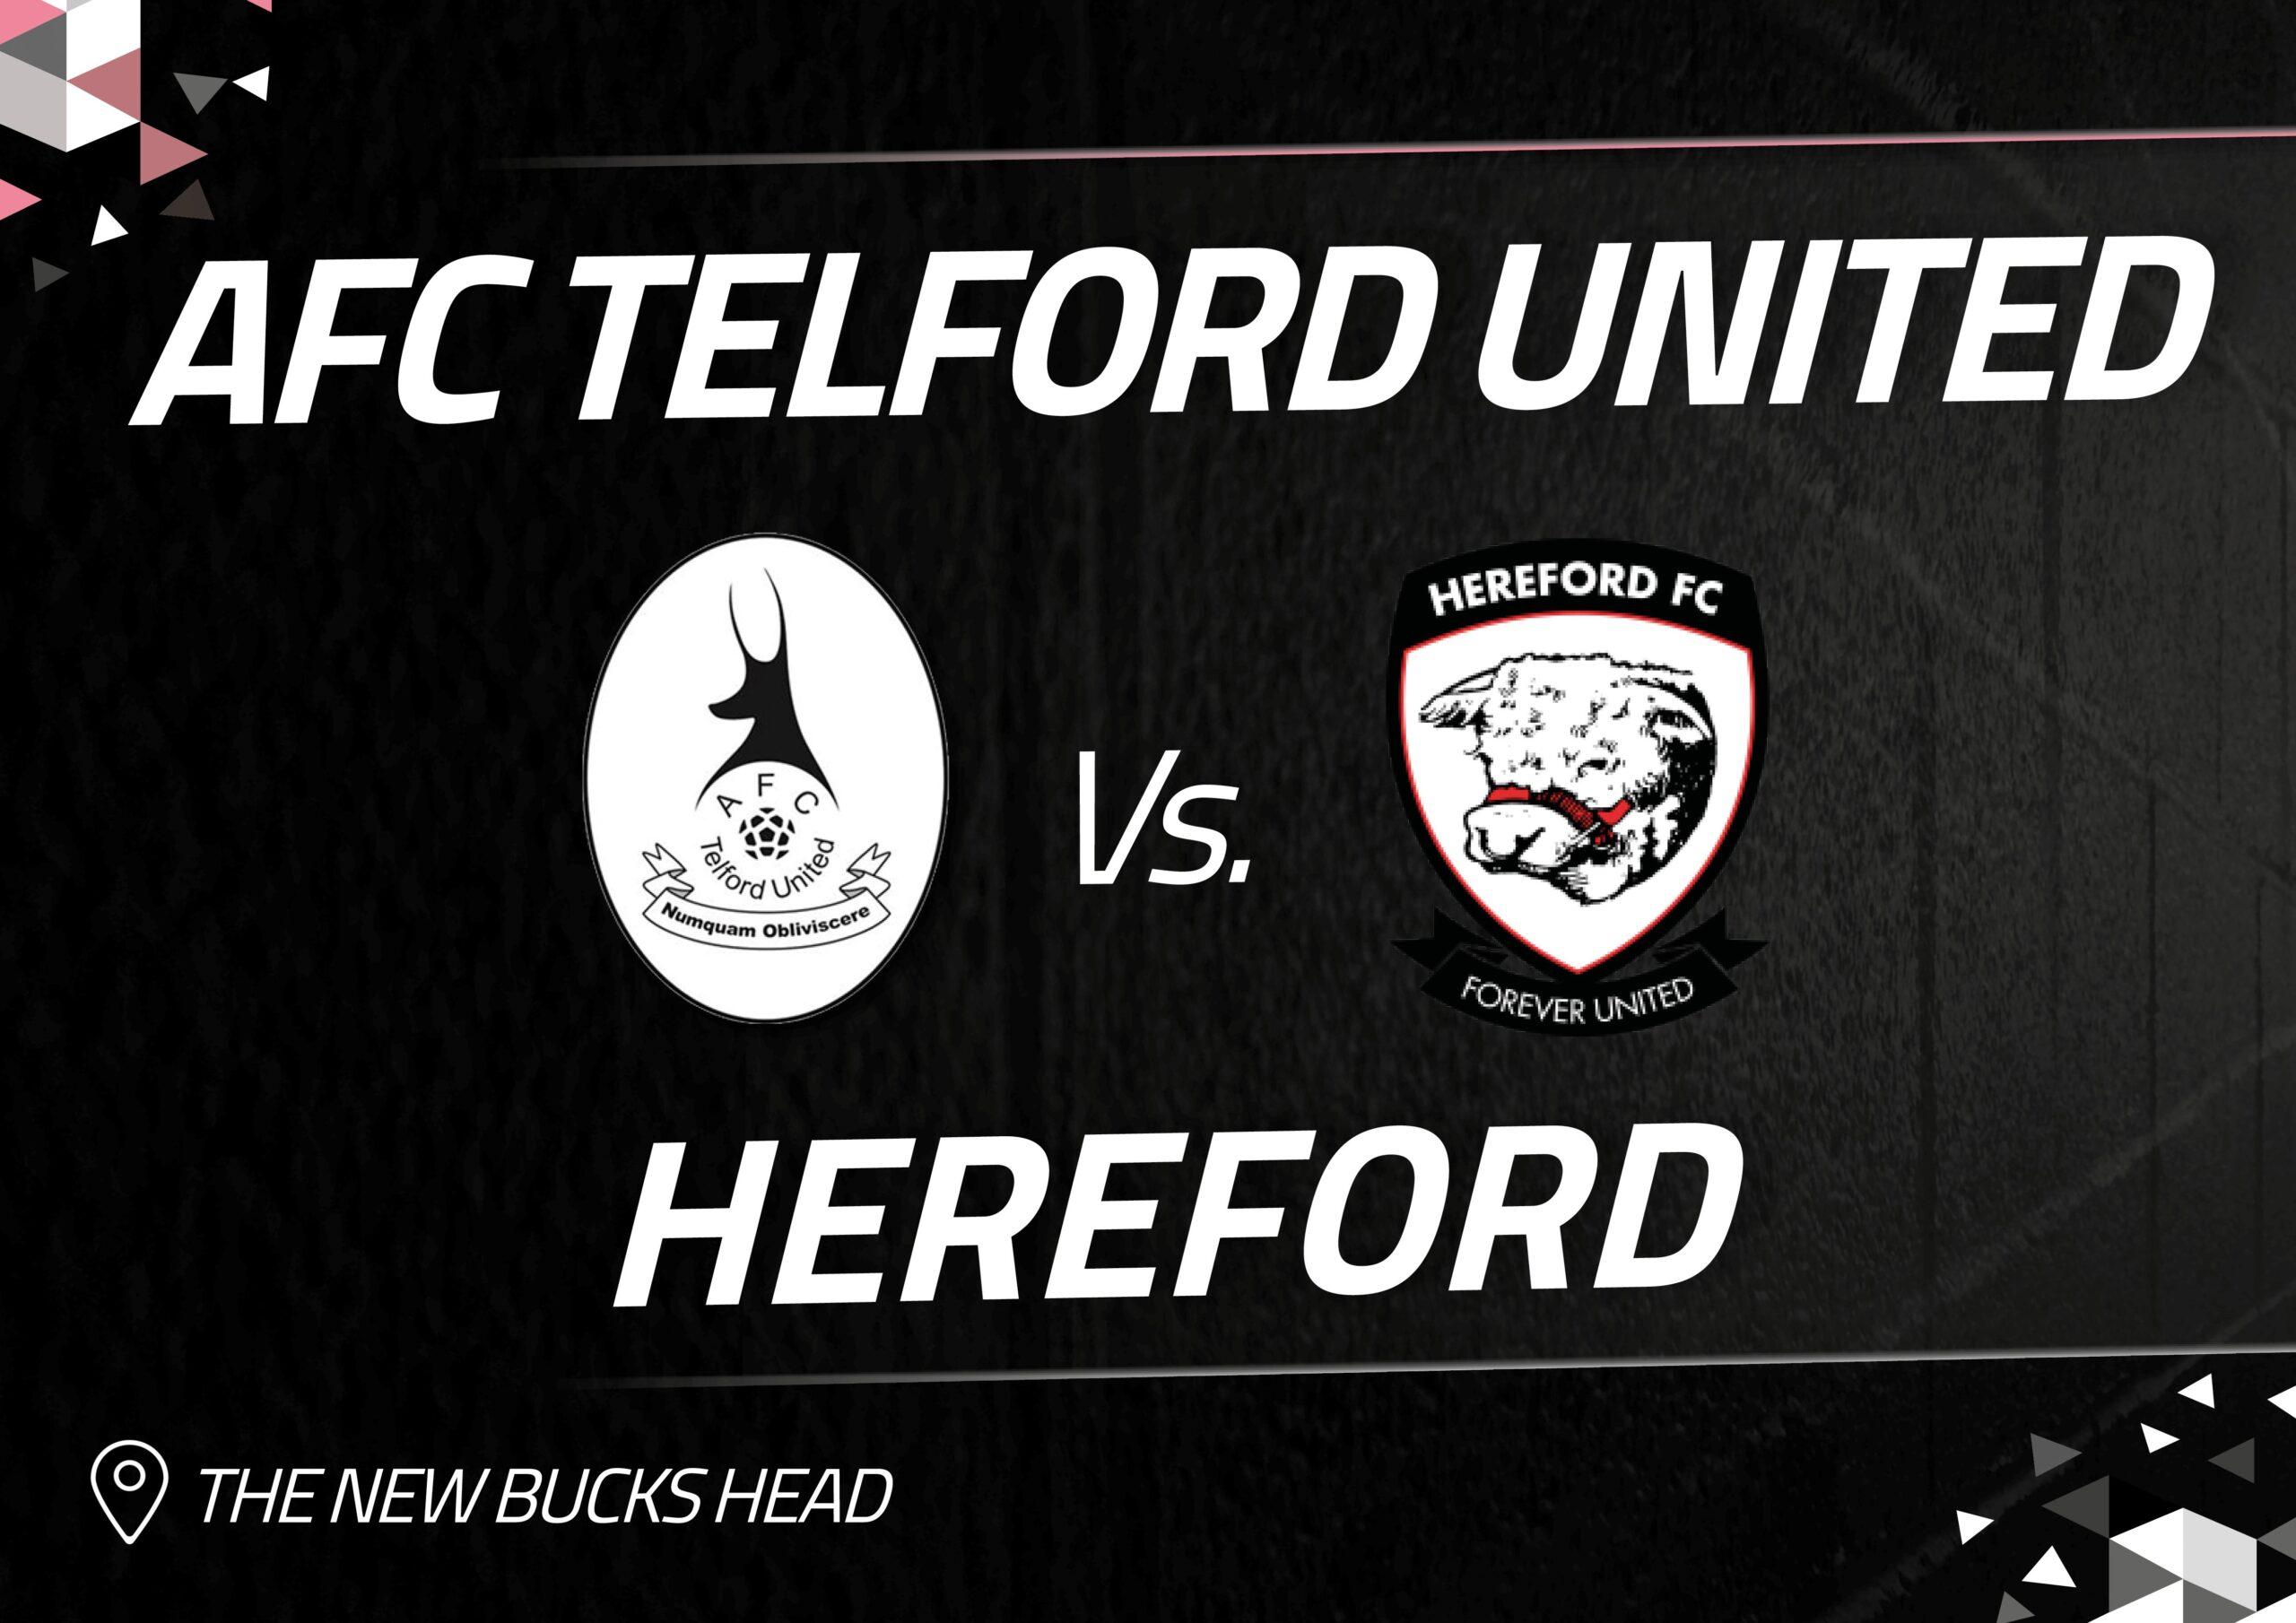 Hereford fixture postponed